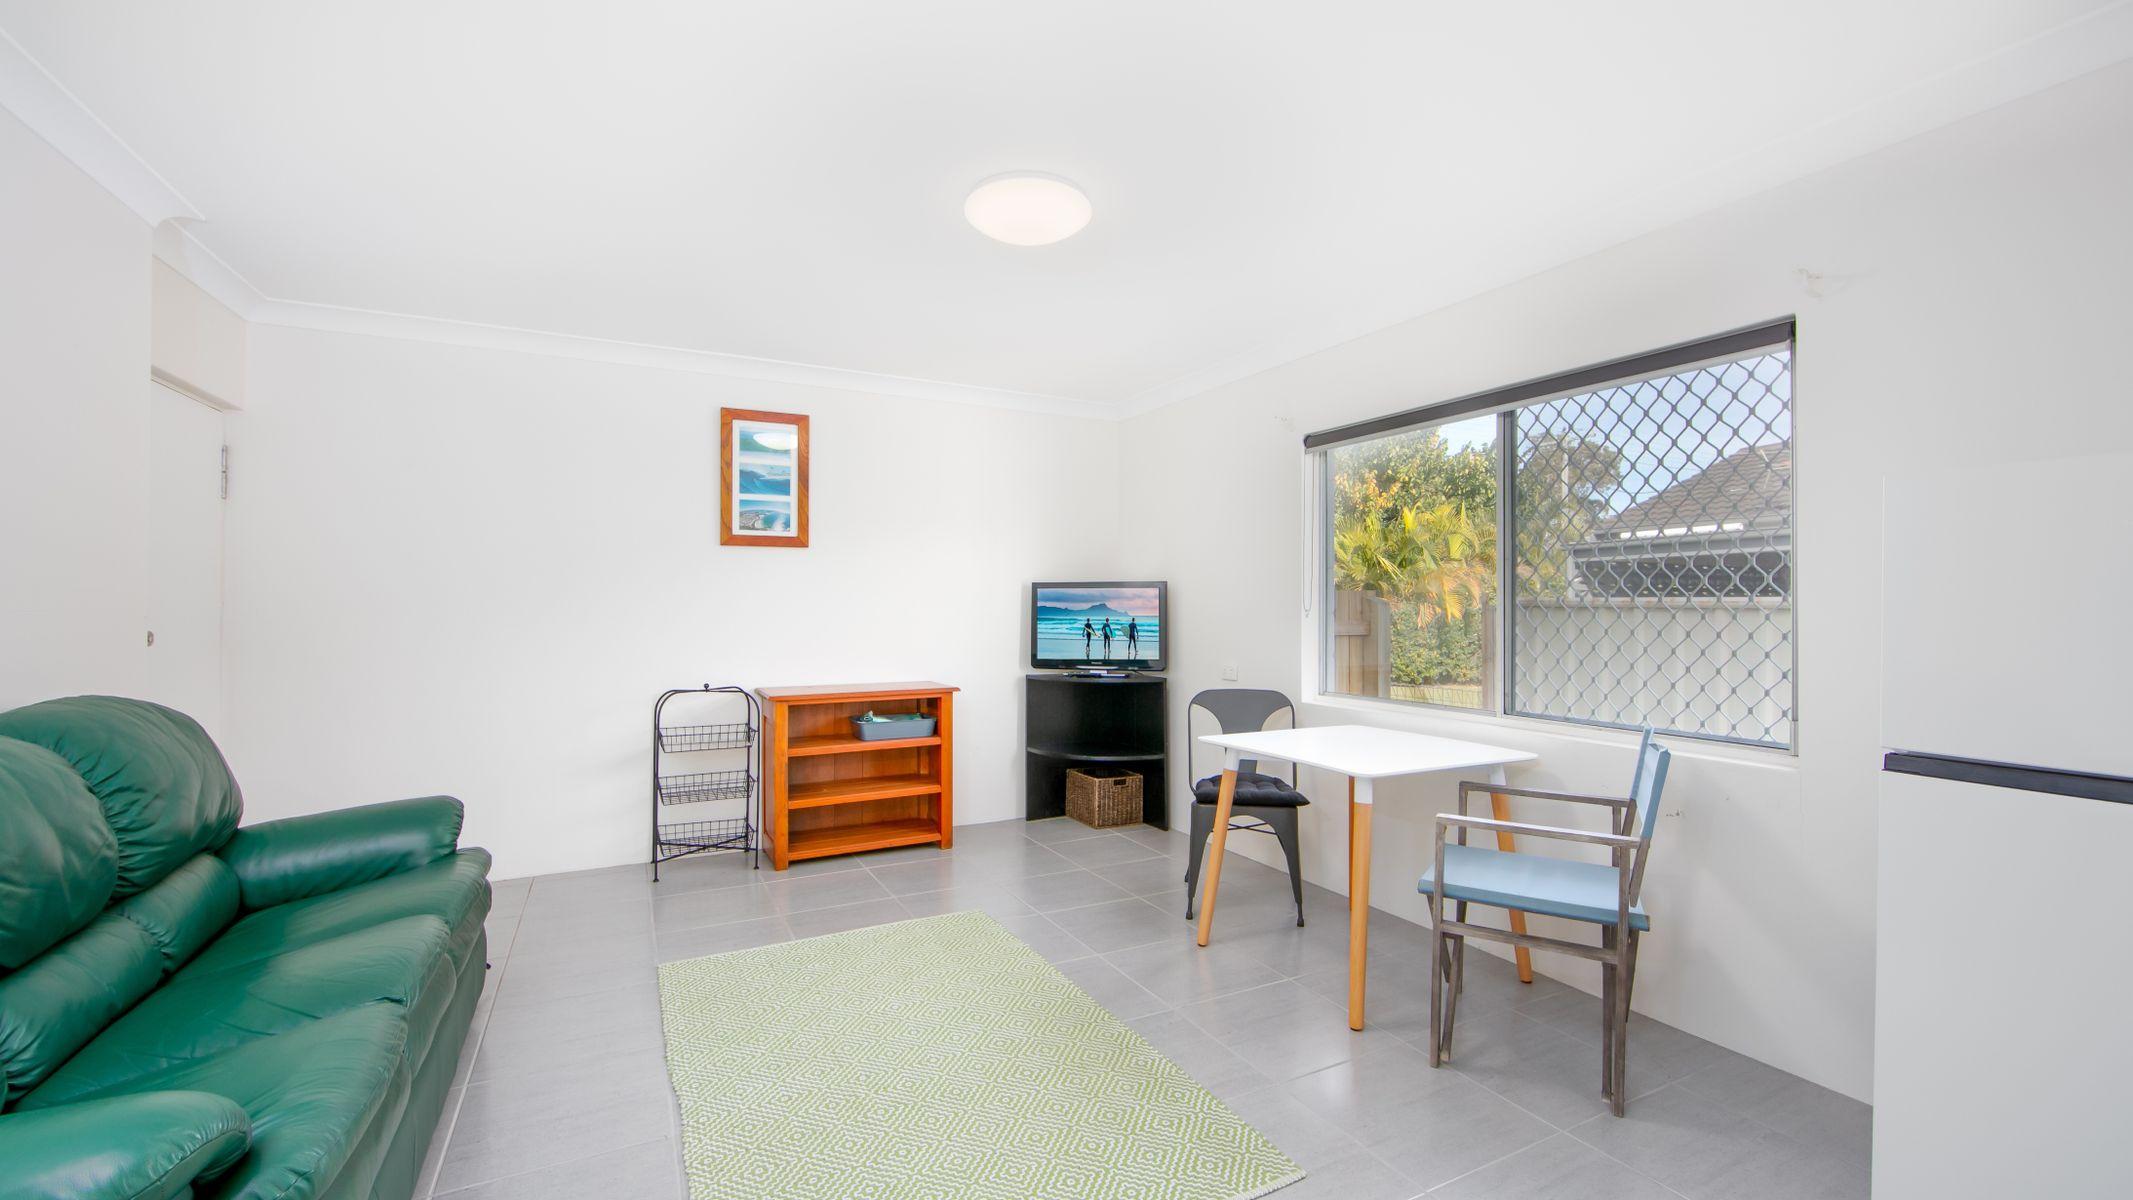 29 Queen Street, Yamba, NSW 2464